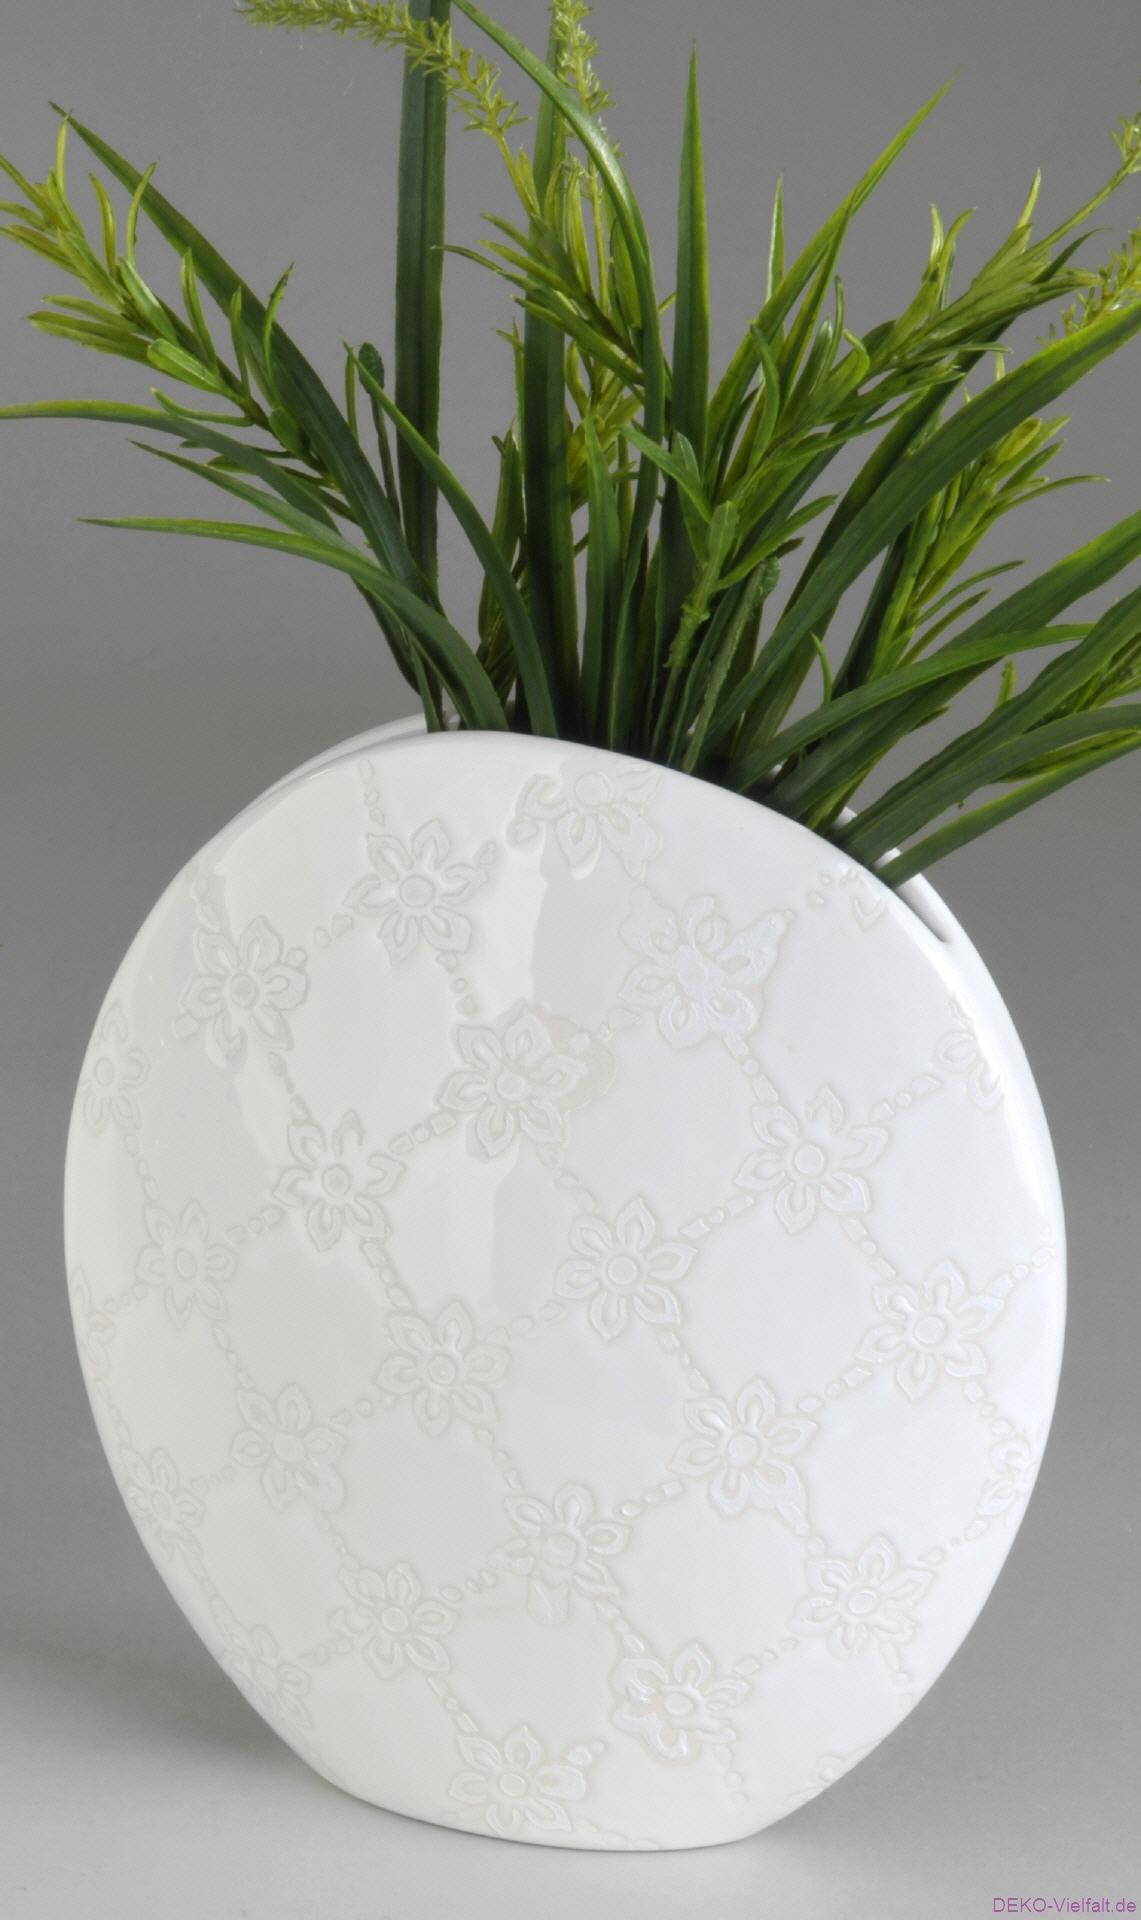 formano vase romantica oval 23 cm deko vielfalt. Black Bedroom Furniture Sets. Home Design Ideas